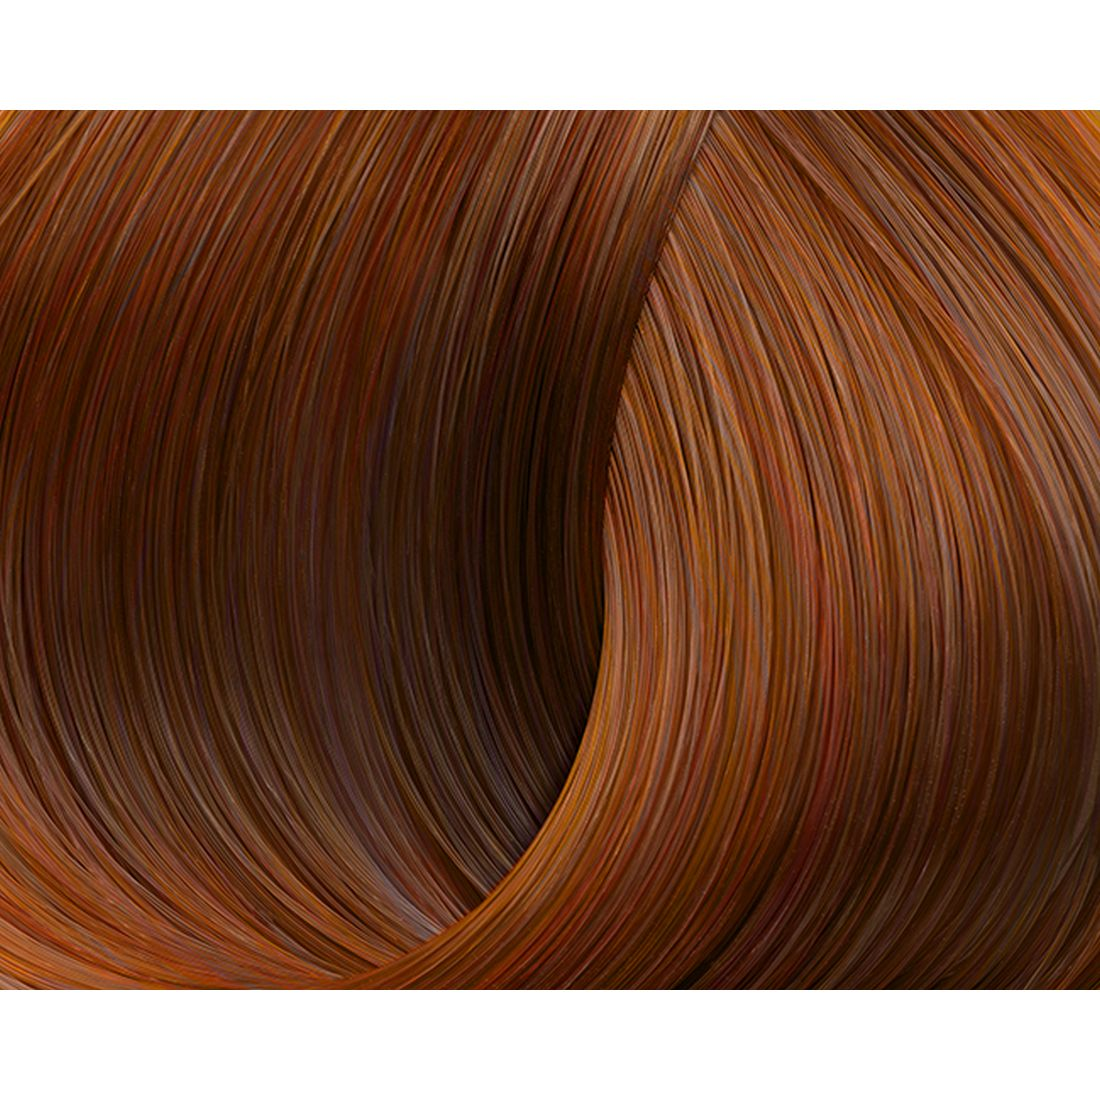 Lorvenn Color Pure Μόνιμο Χρώμα Χωρίς Αμμωνία 50ml No 7.40 Ξανθό Χάλκινο No 7.40 Ξανθό Χάλκινο